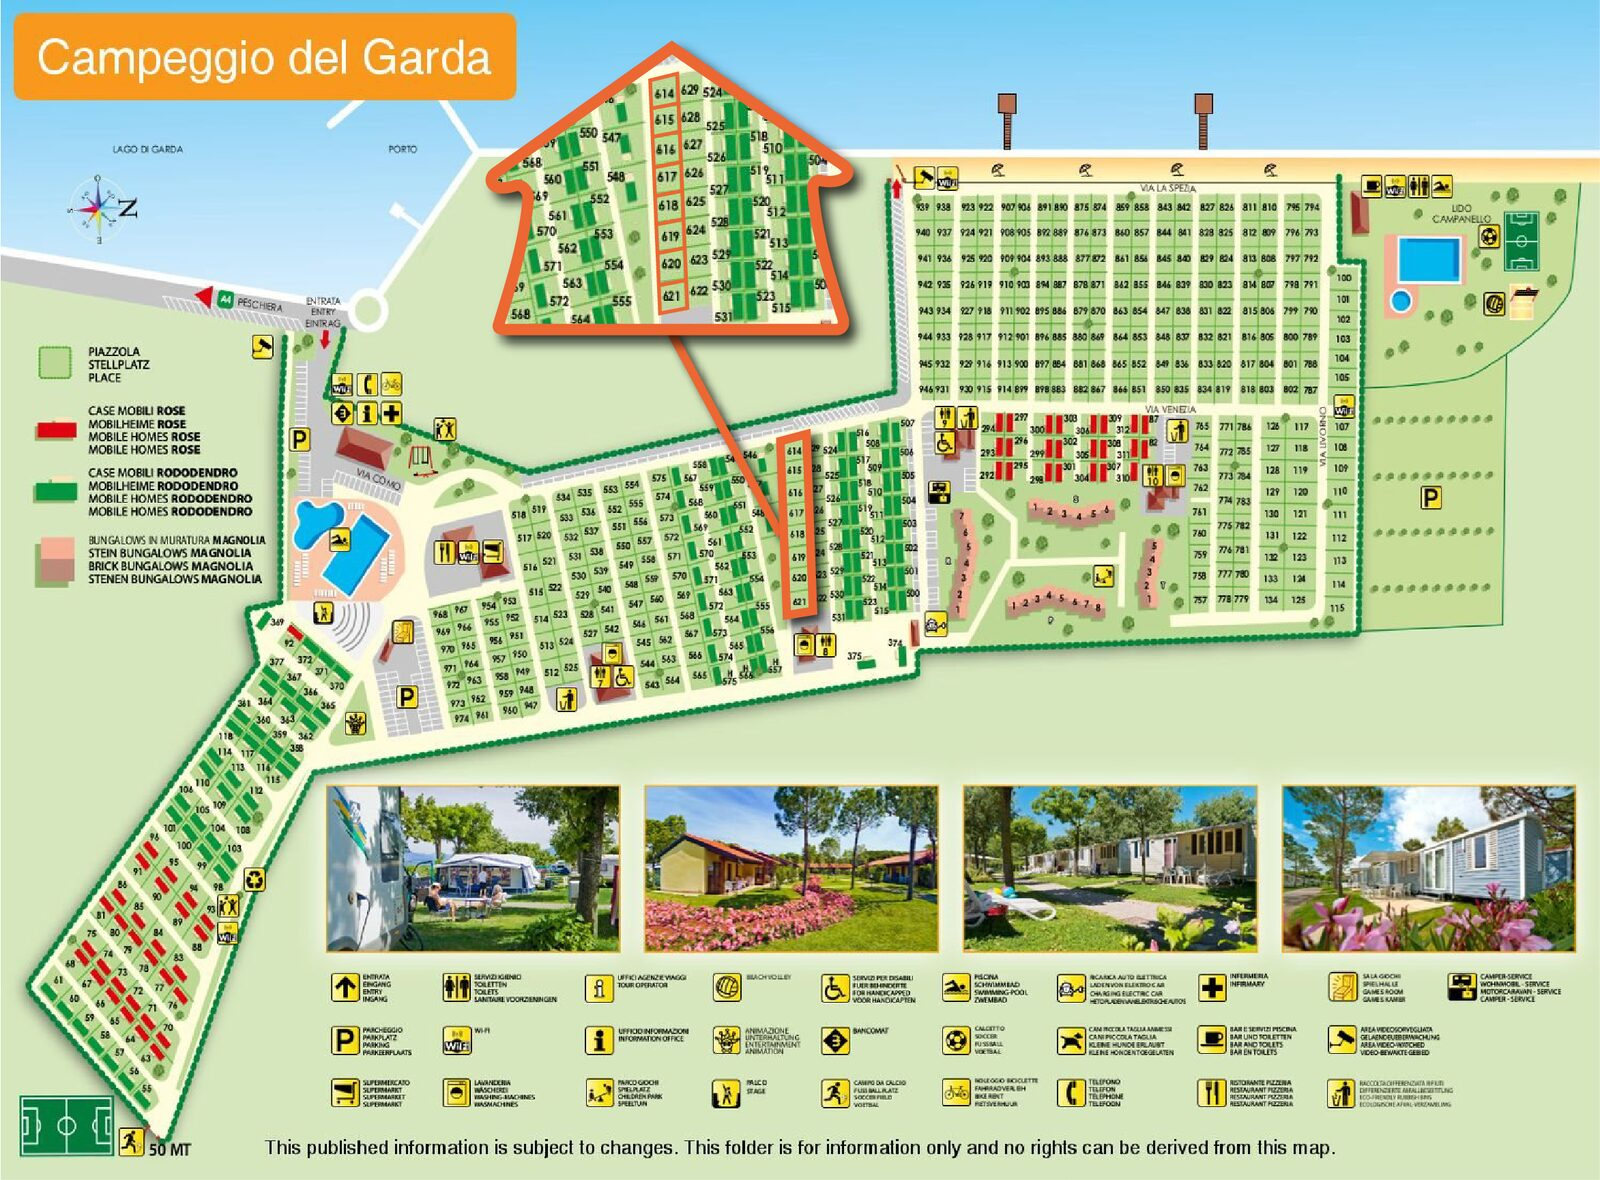 Plattegrond Campeggio del Garda